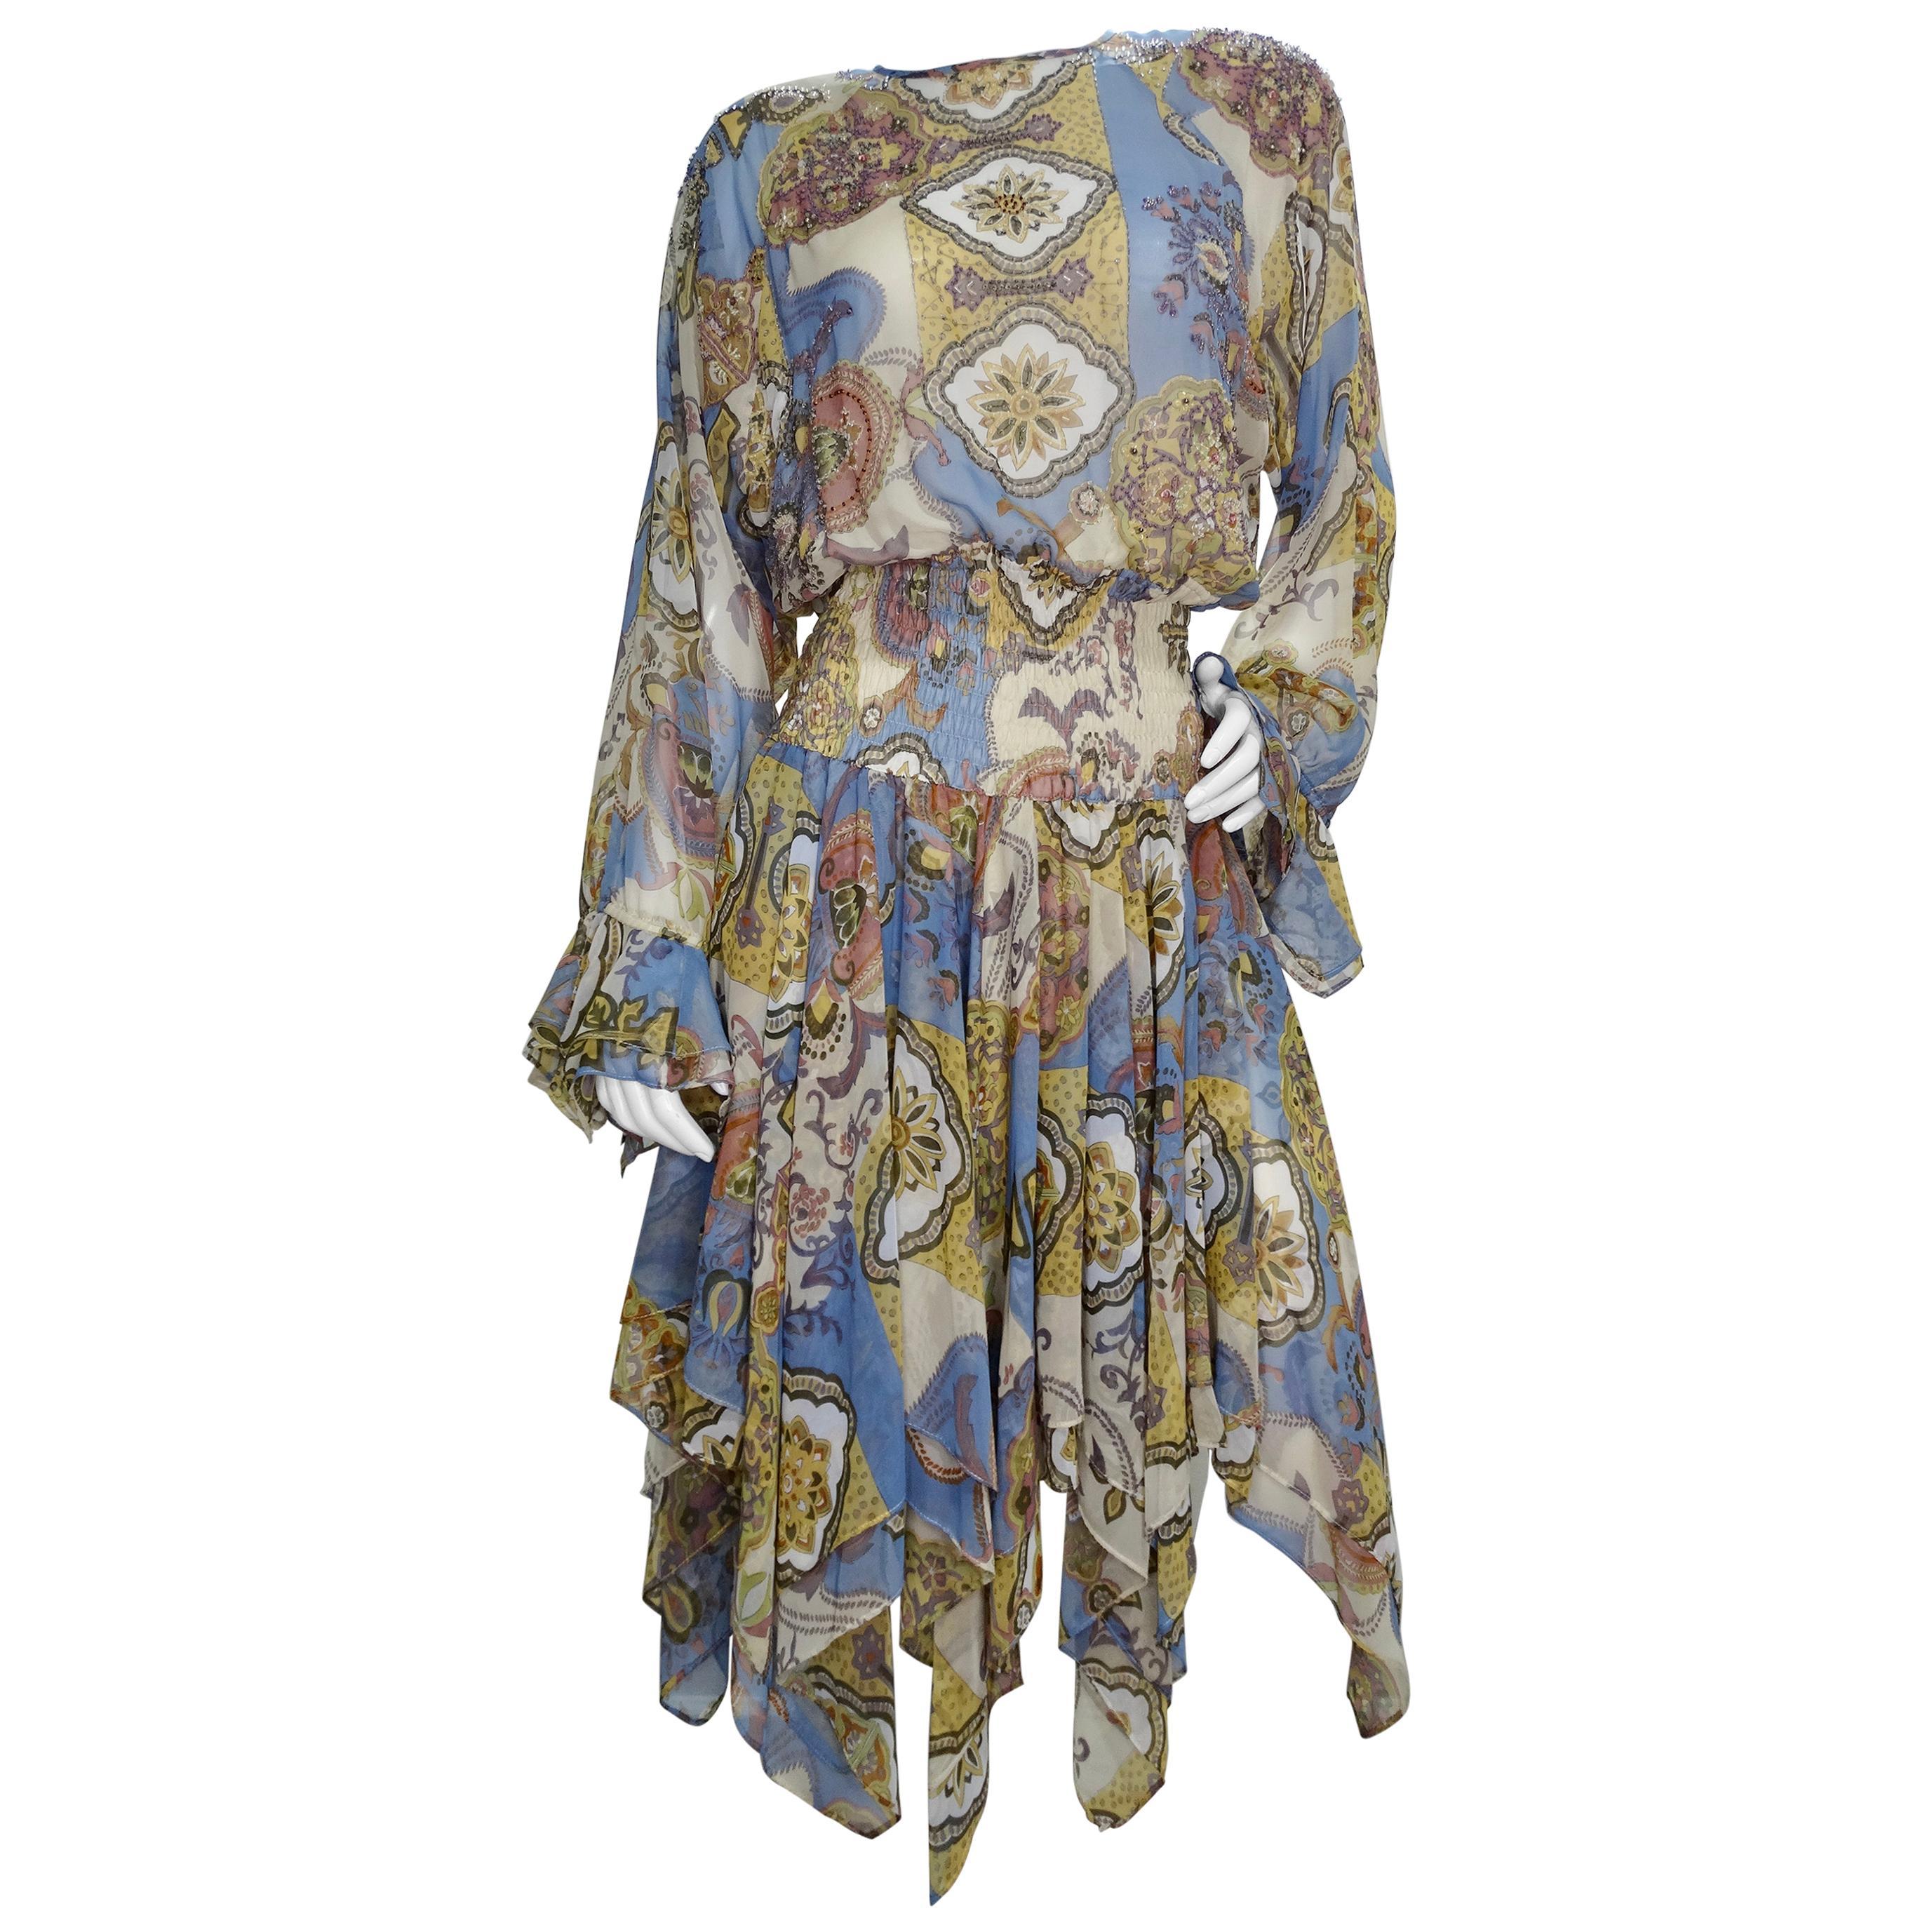 Diane Freis 1980s Printed Dress